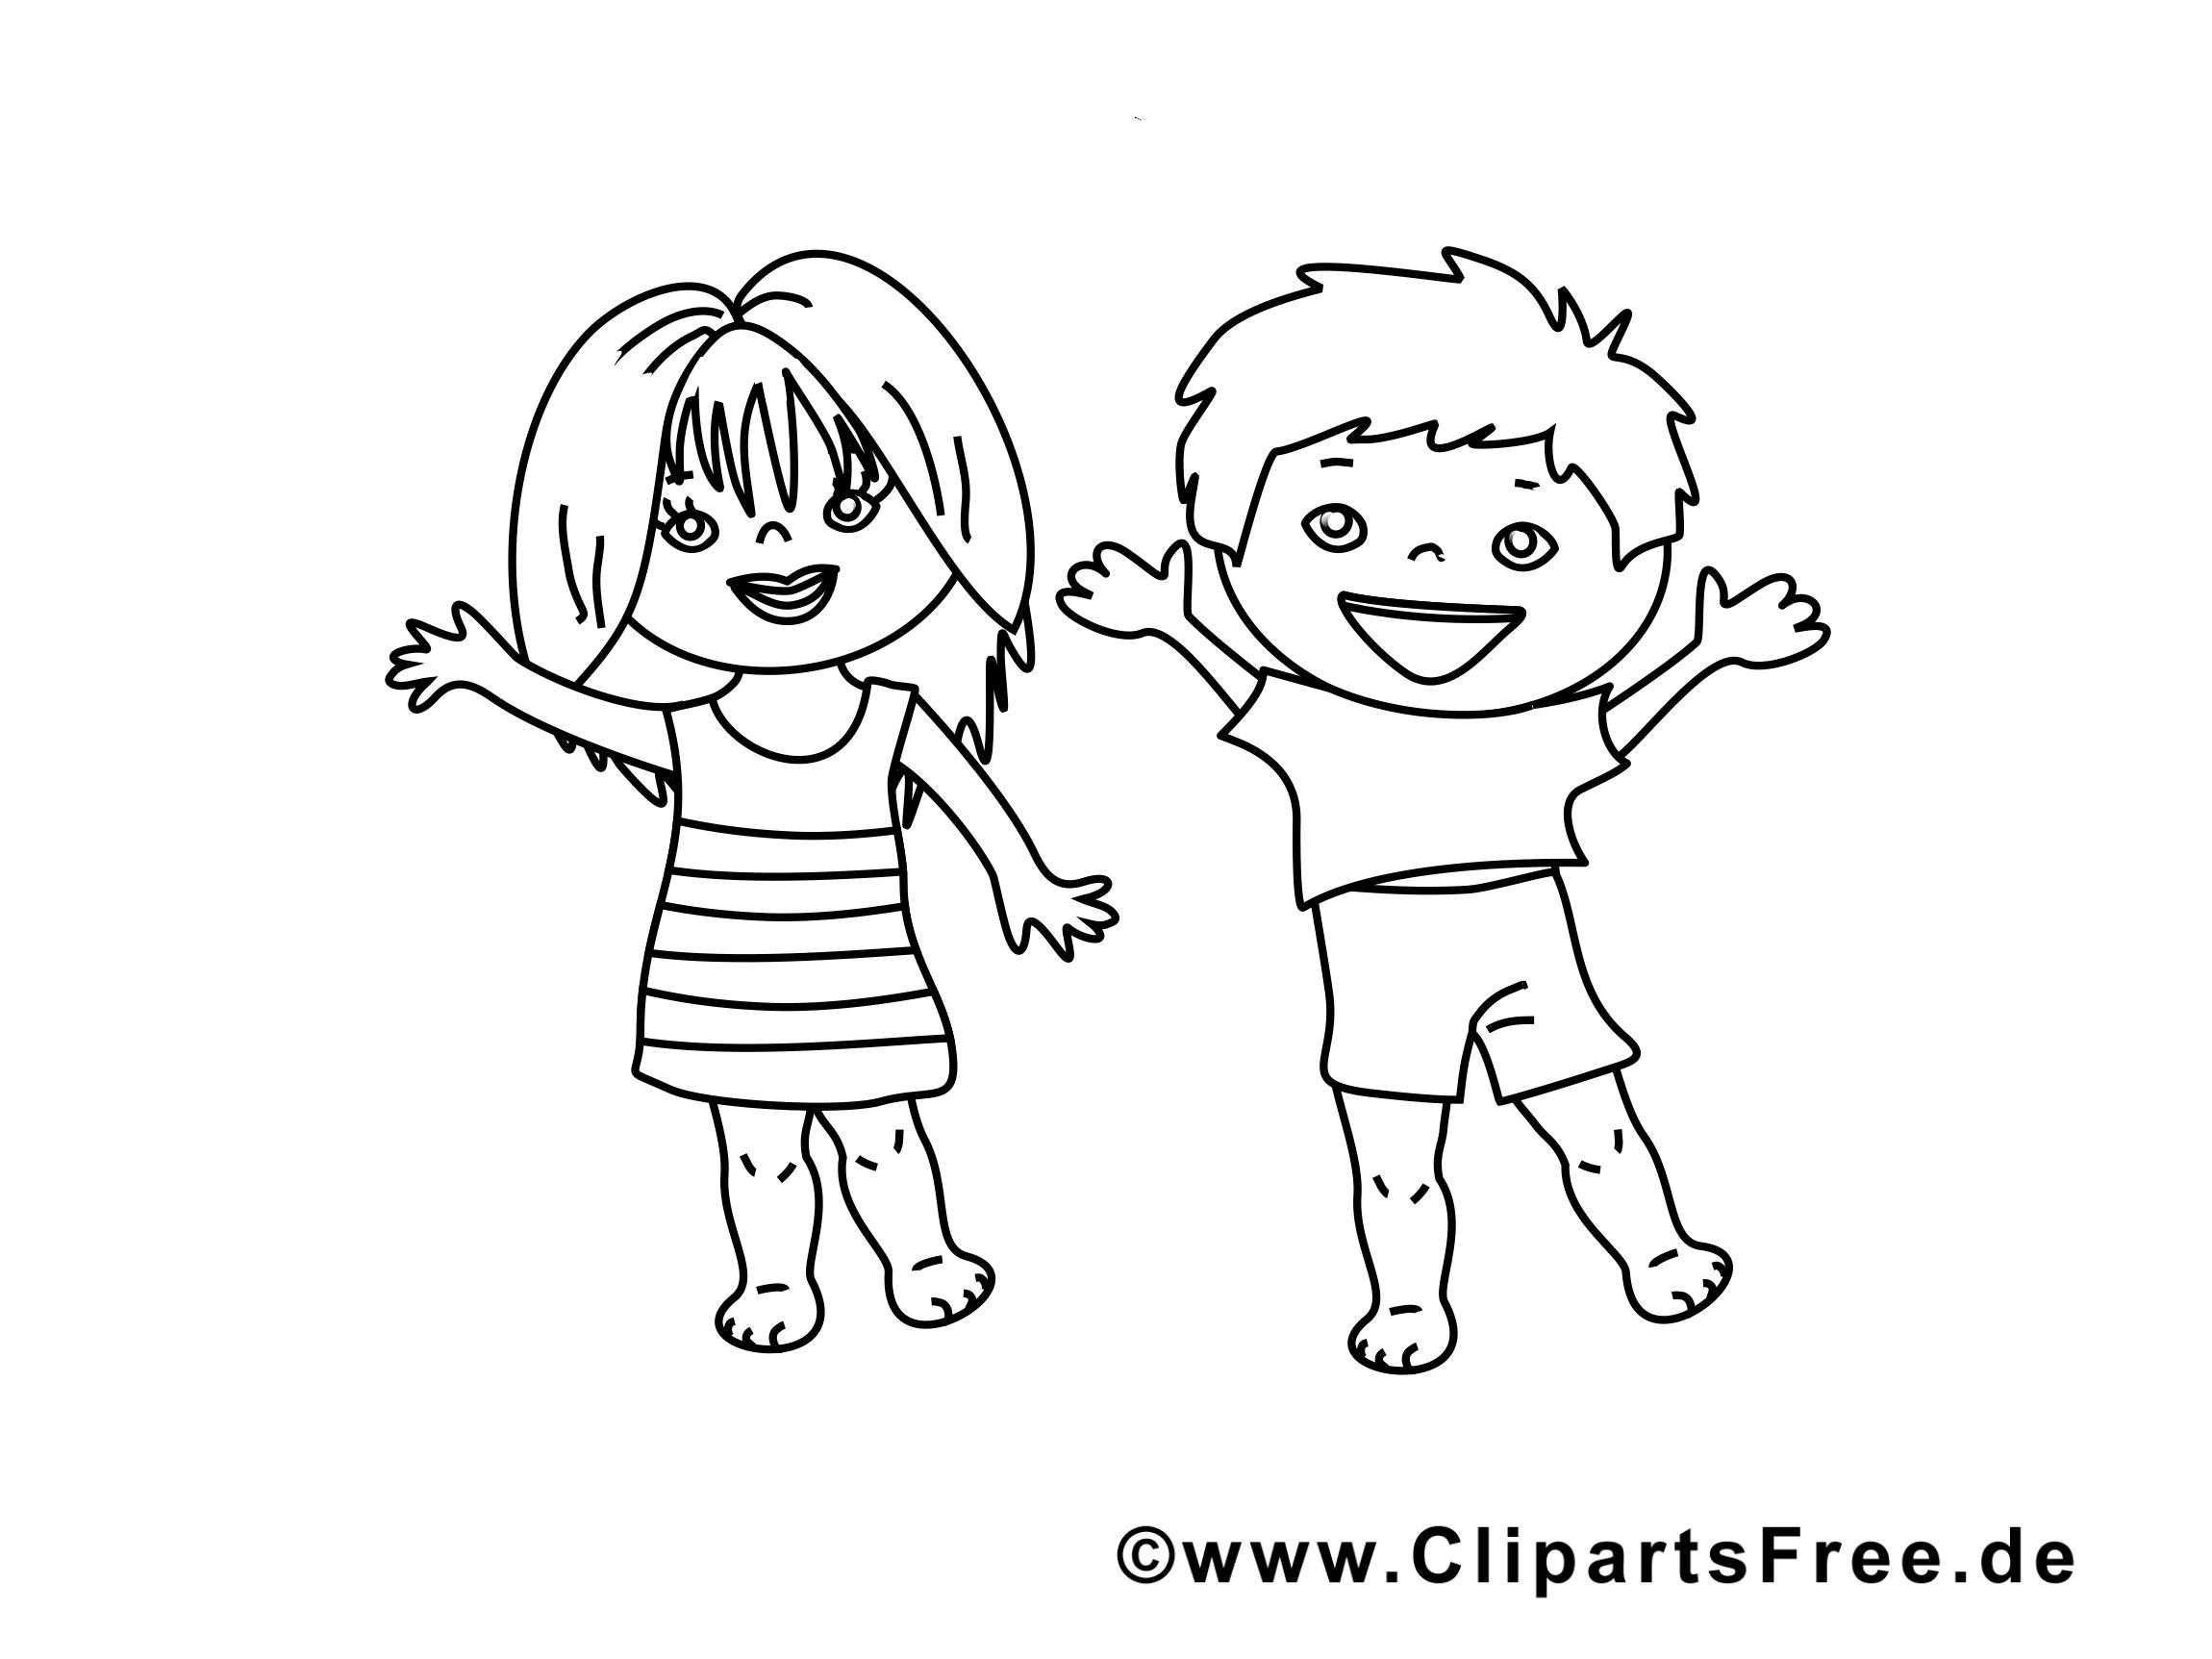 Coloriage enfants - Maternelle illustration Kopie